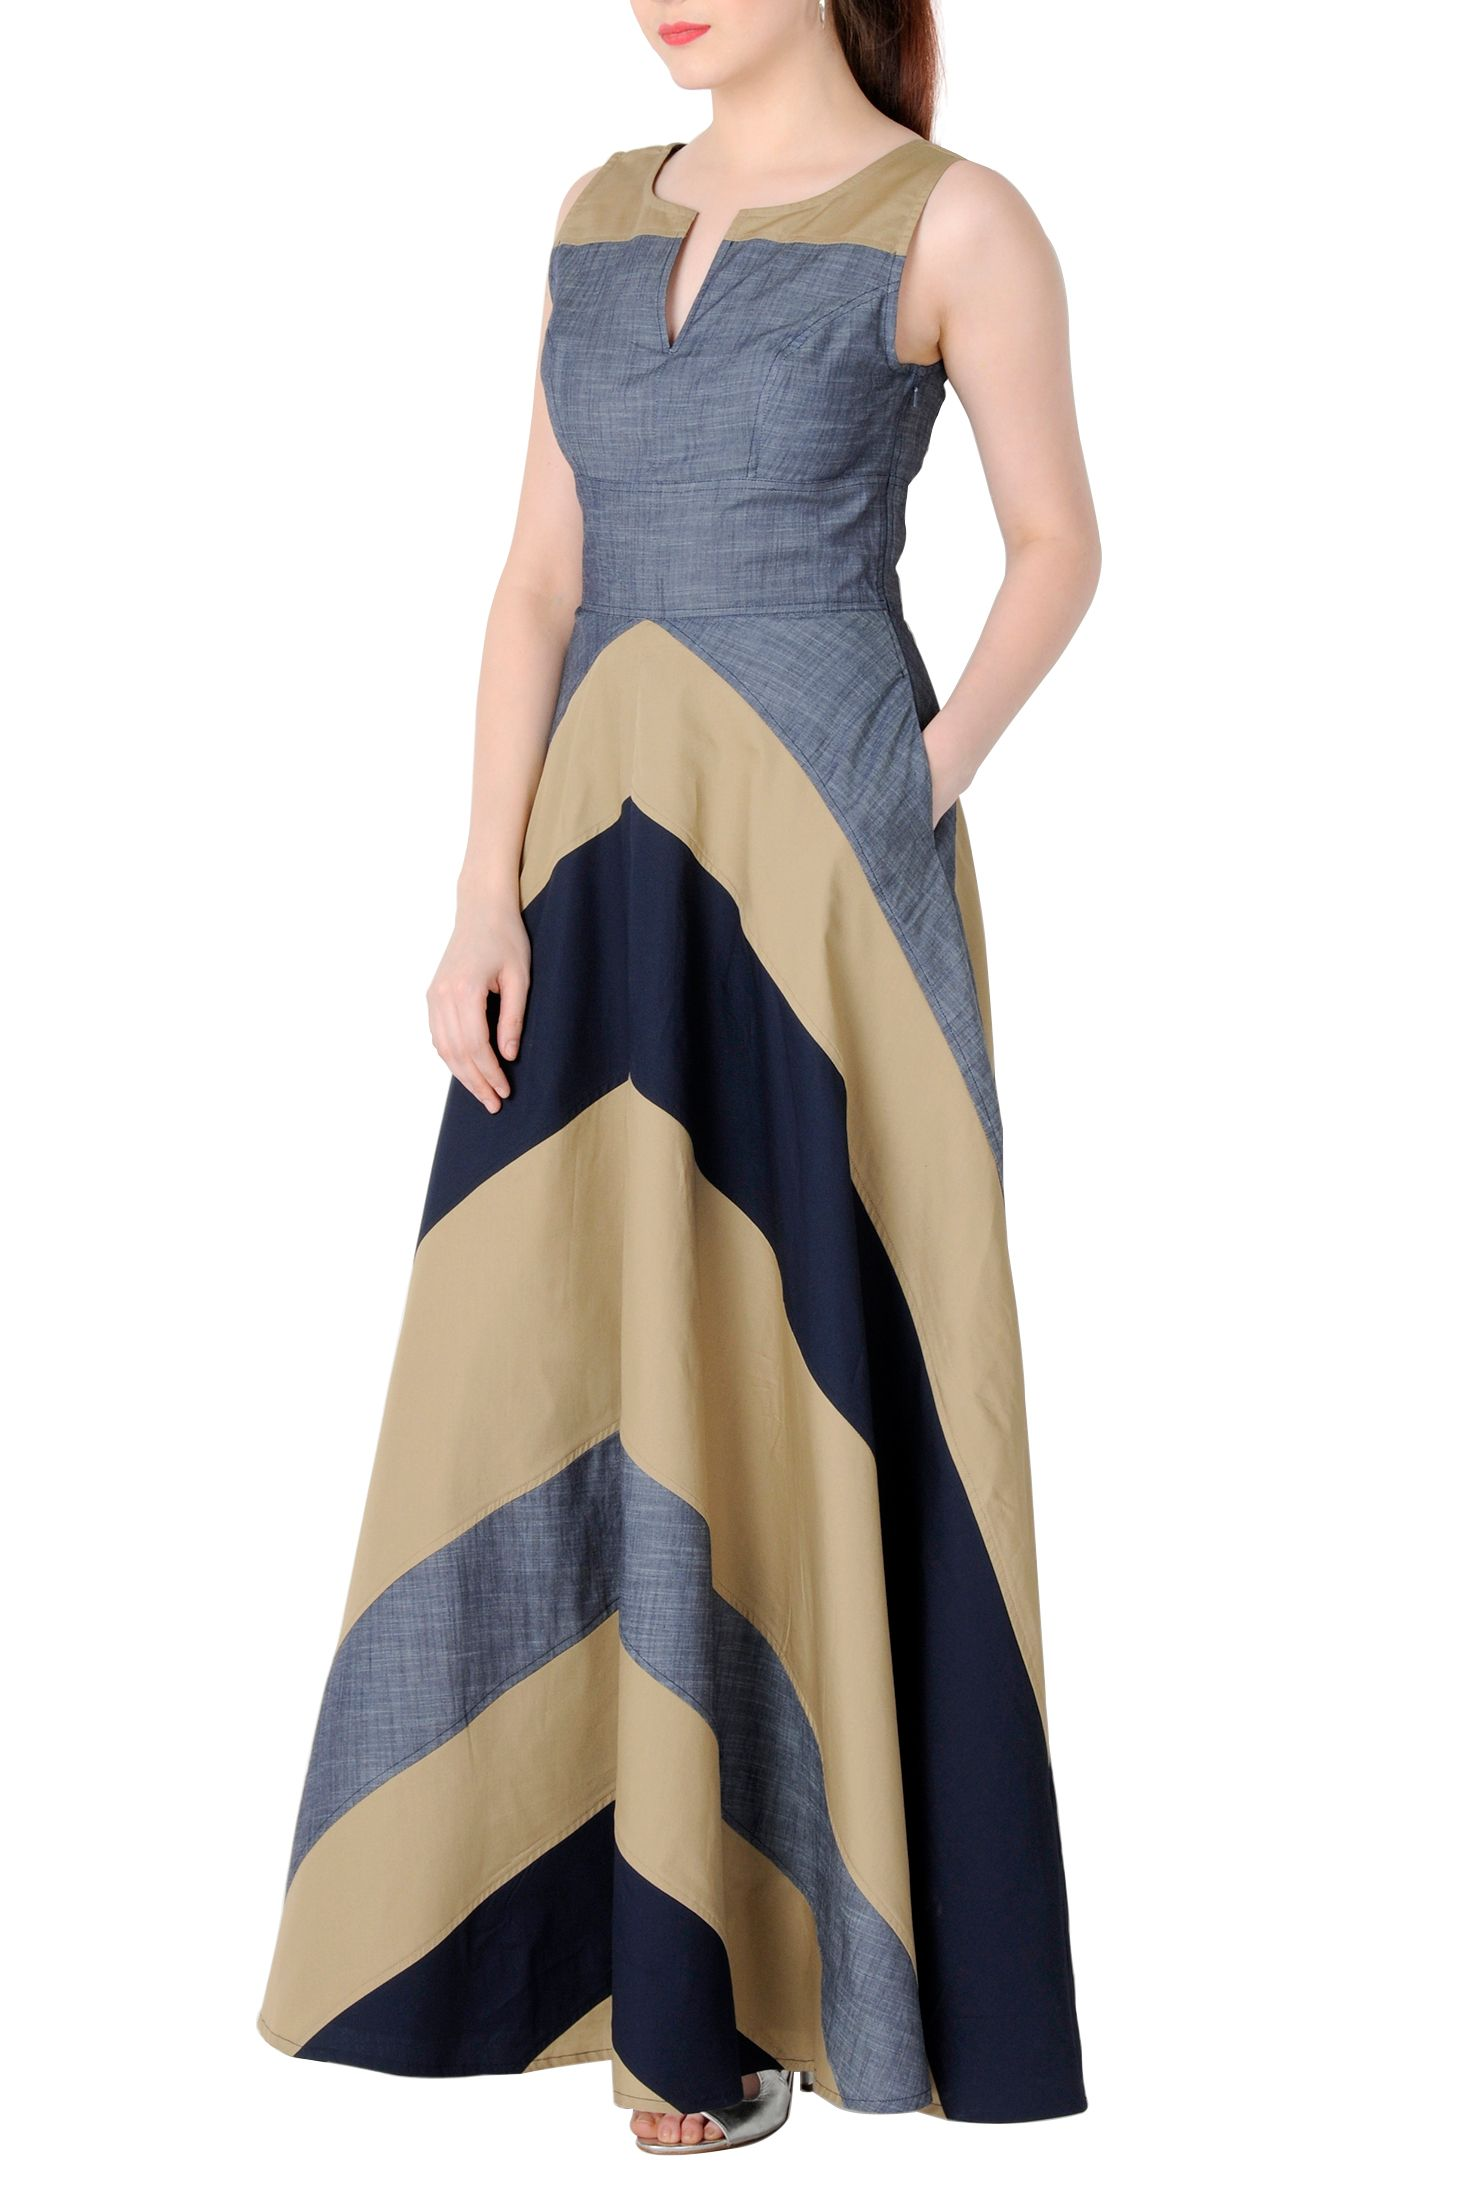 Shop womens designer dresses bridesmaid dresses bridesmaid dress